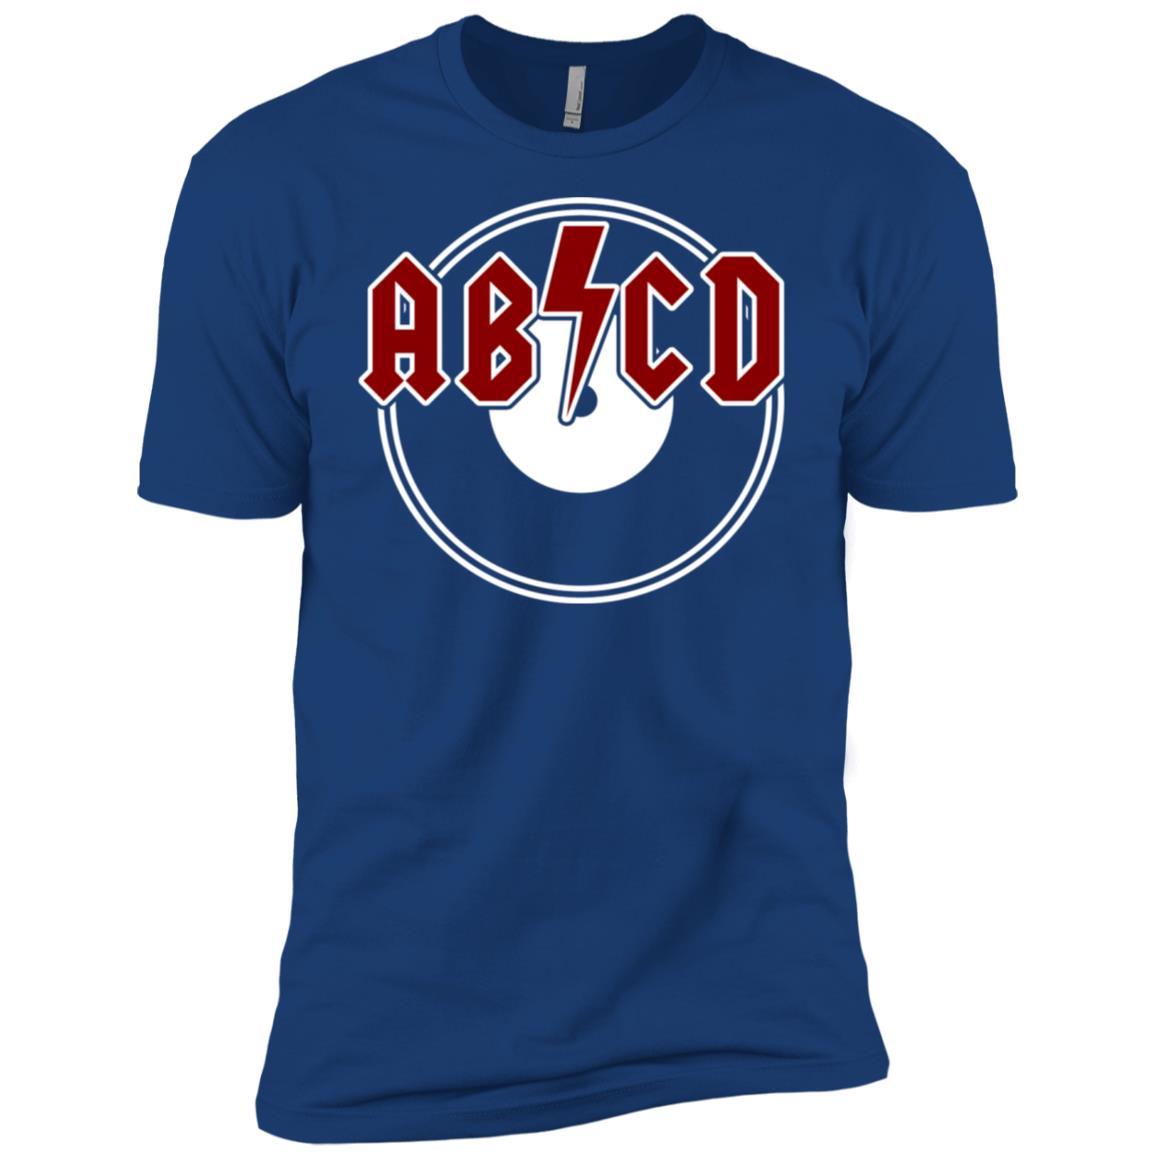 ABCDs Funny Rock n Roll Kids Toddler Men Short Sleeve T-Shirt